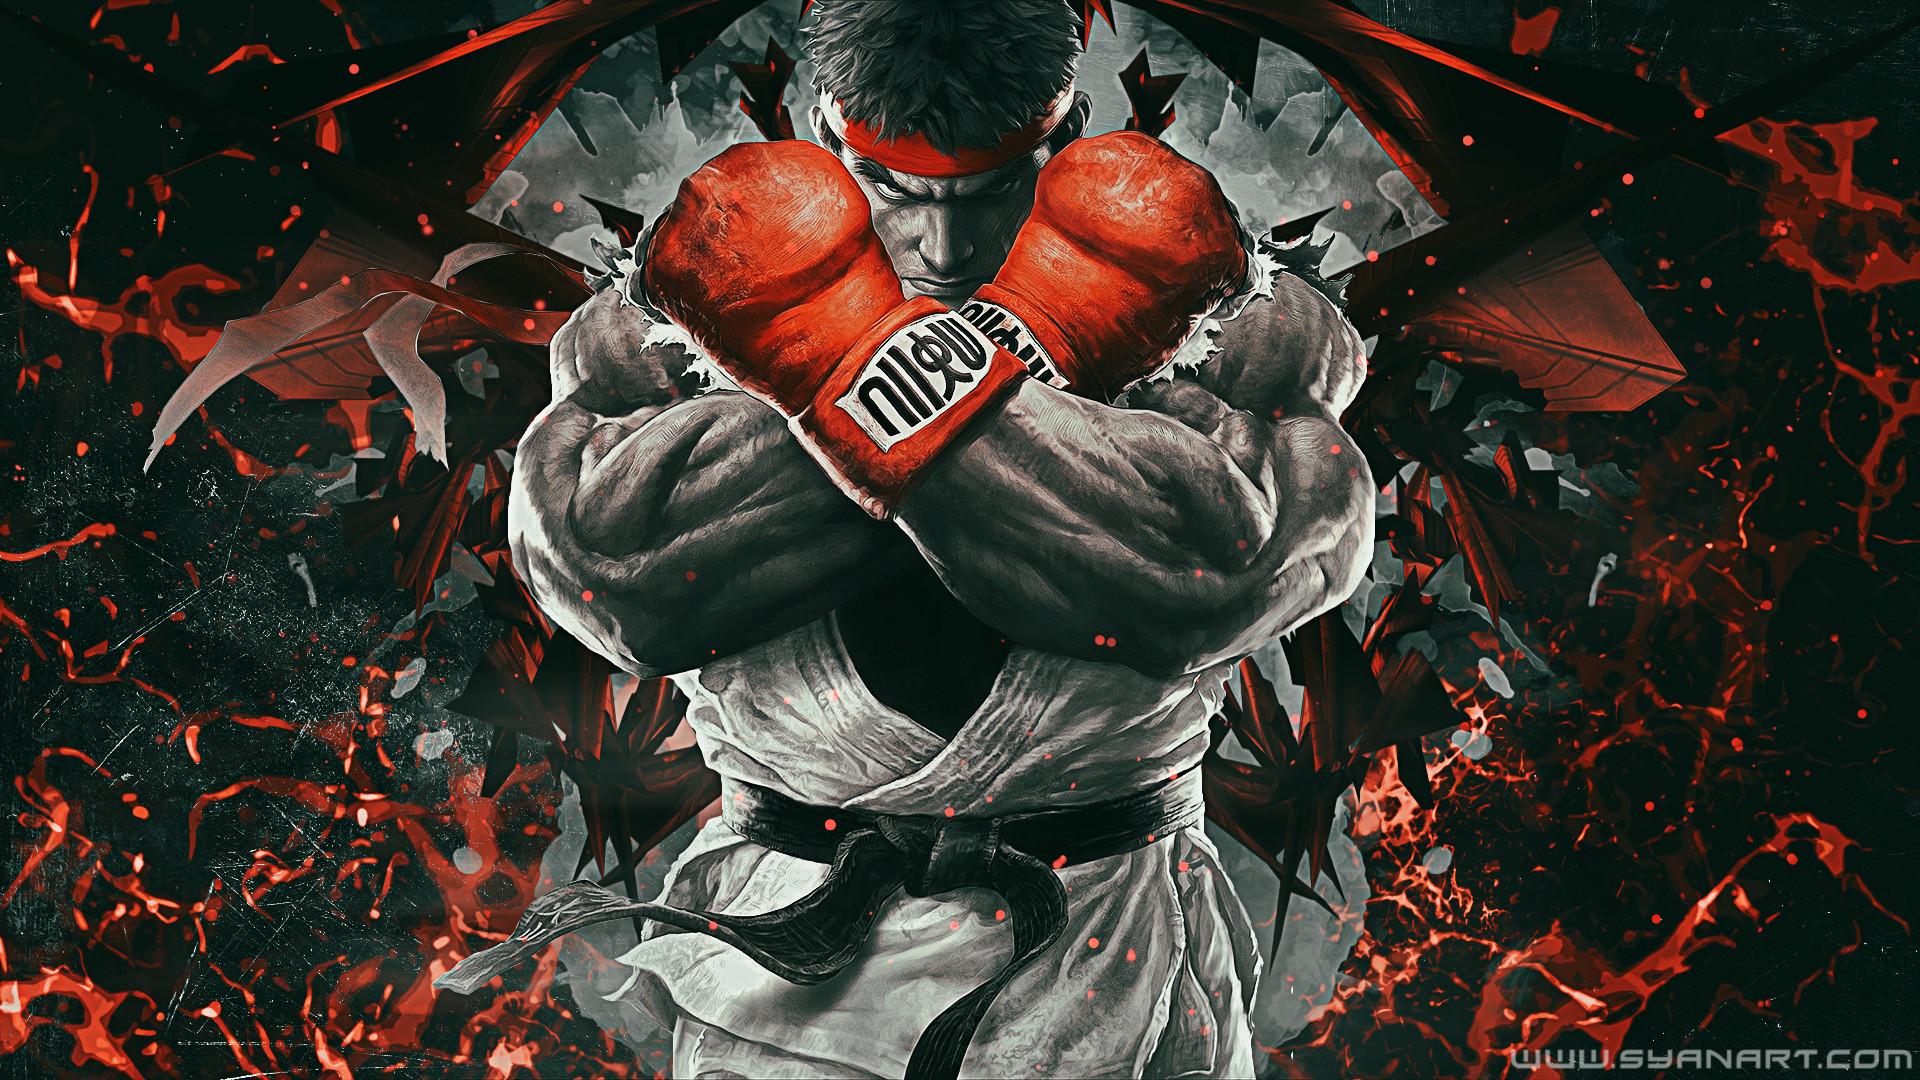 Ryu Street Fighter HD desktop wallpaper High Definition